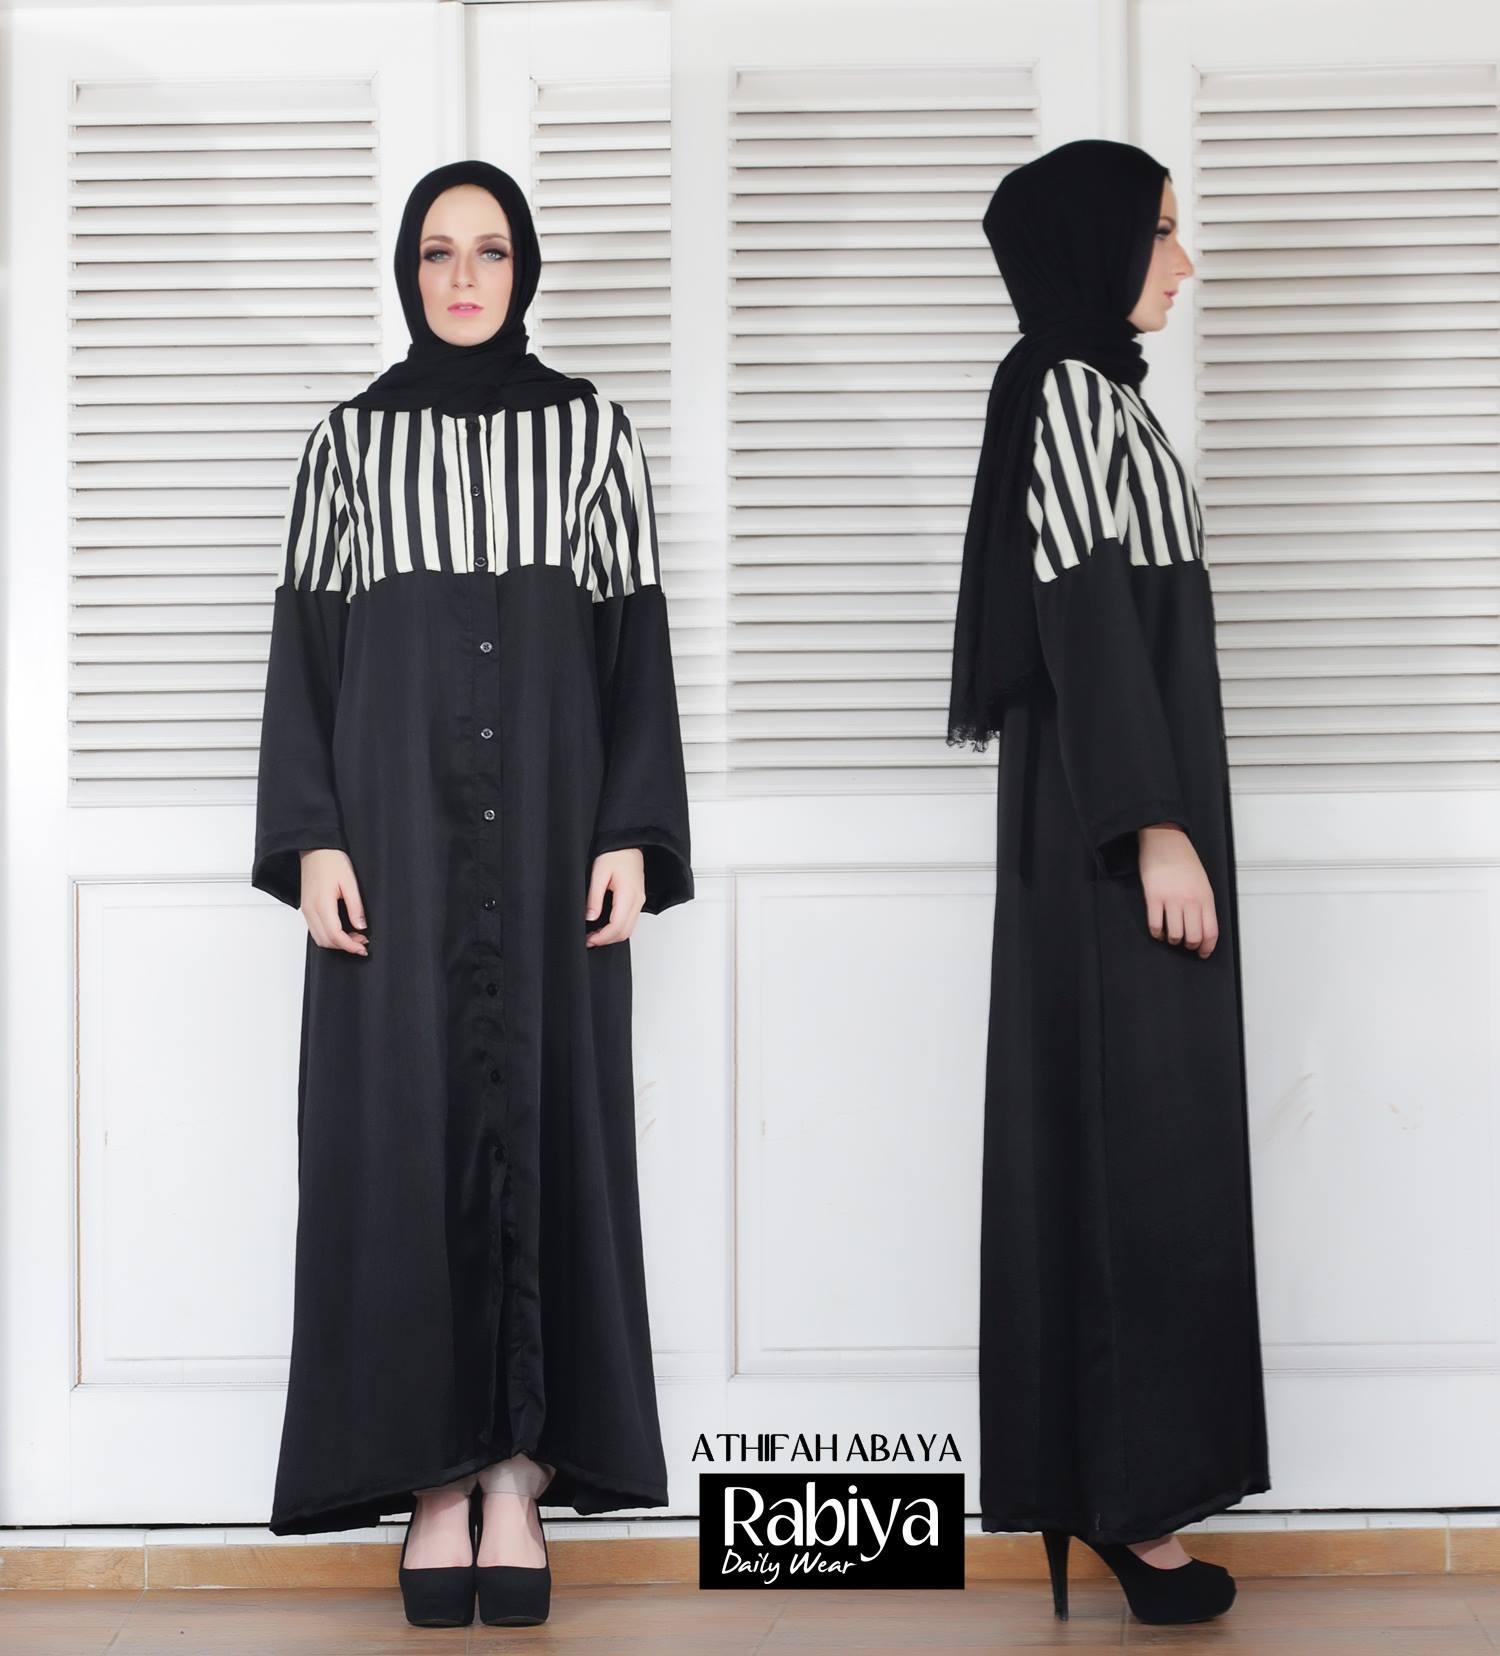 Athifah Abaya Baju Muslim Gamis Modern